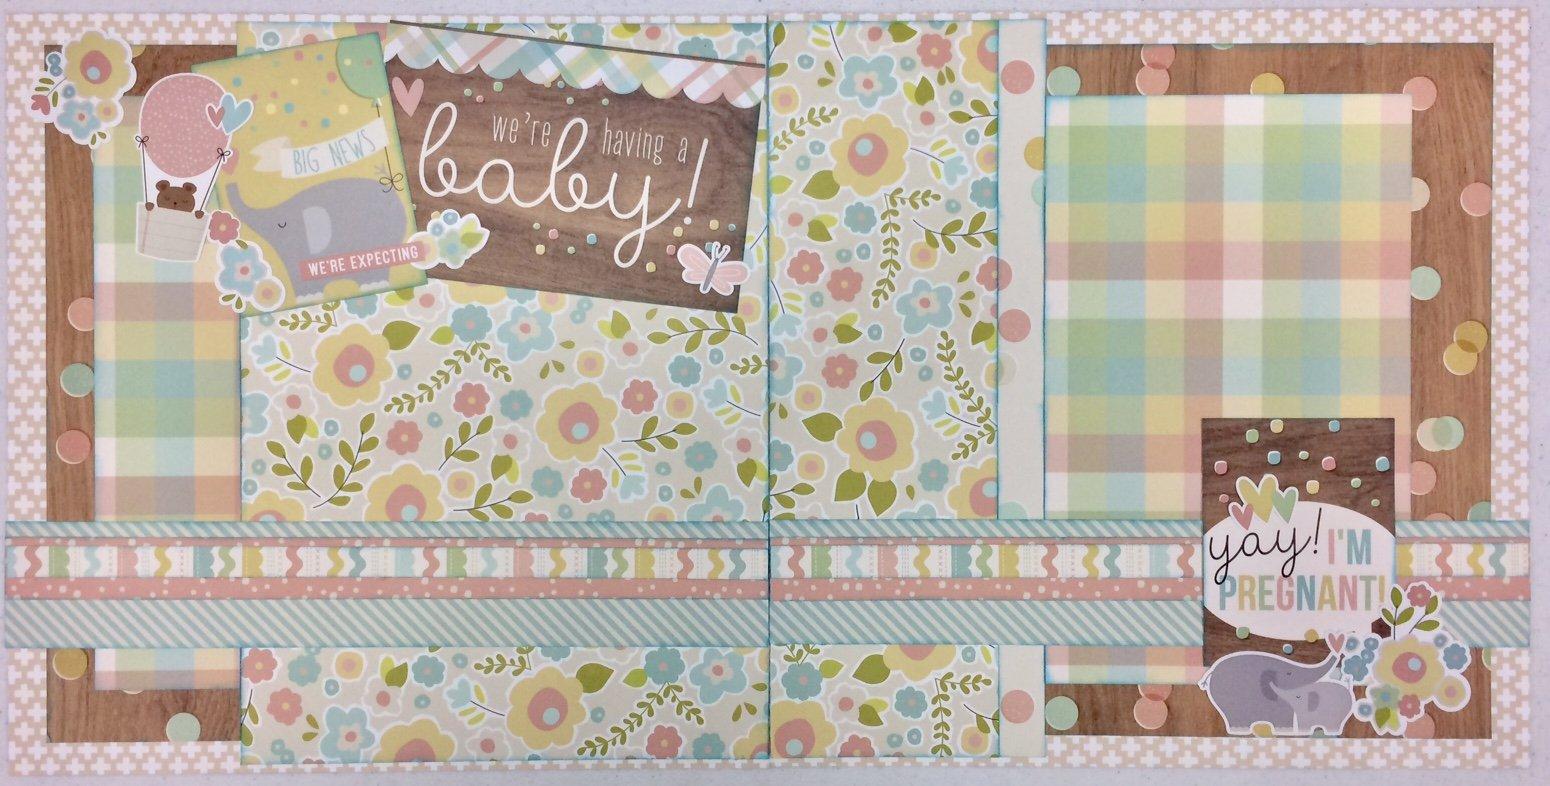 Expecting Baby Layout Kit